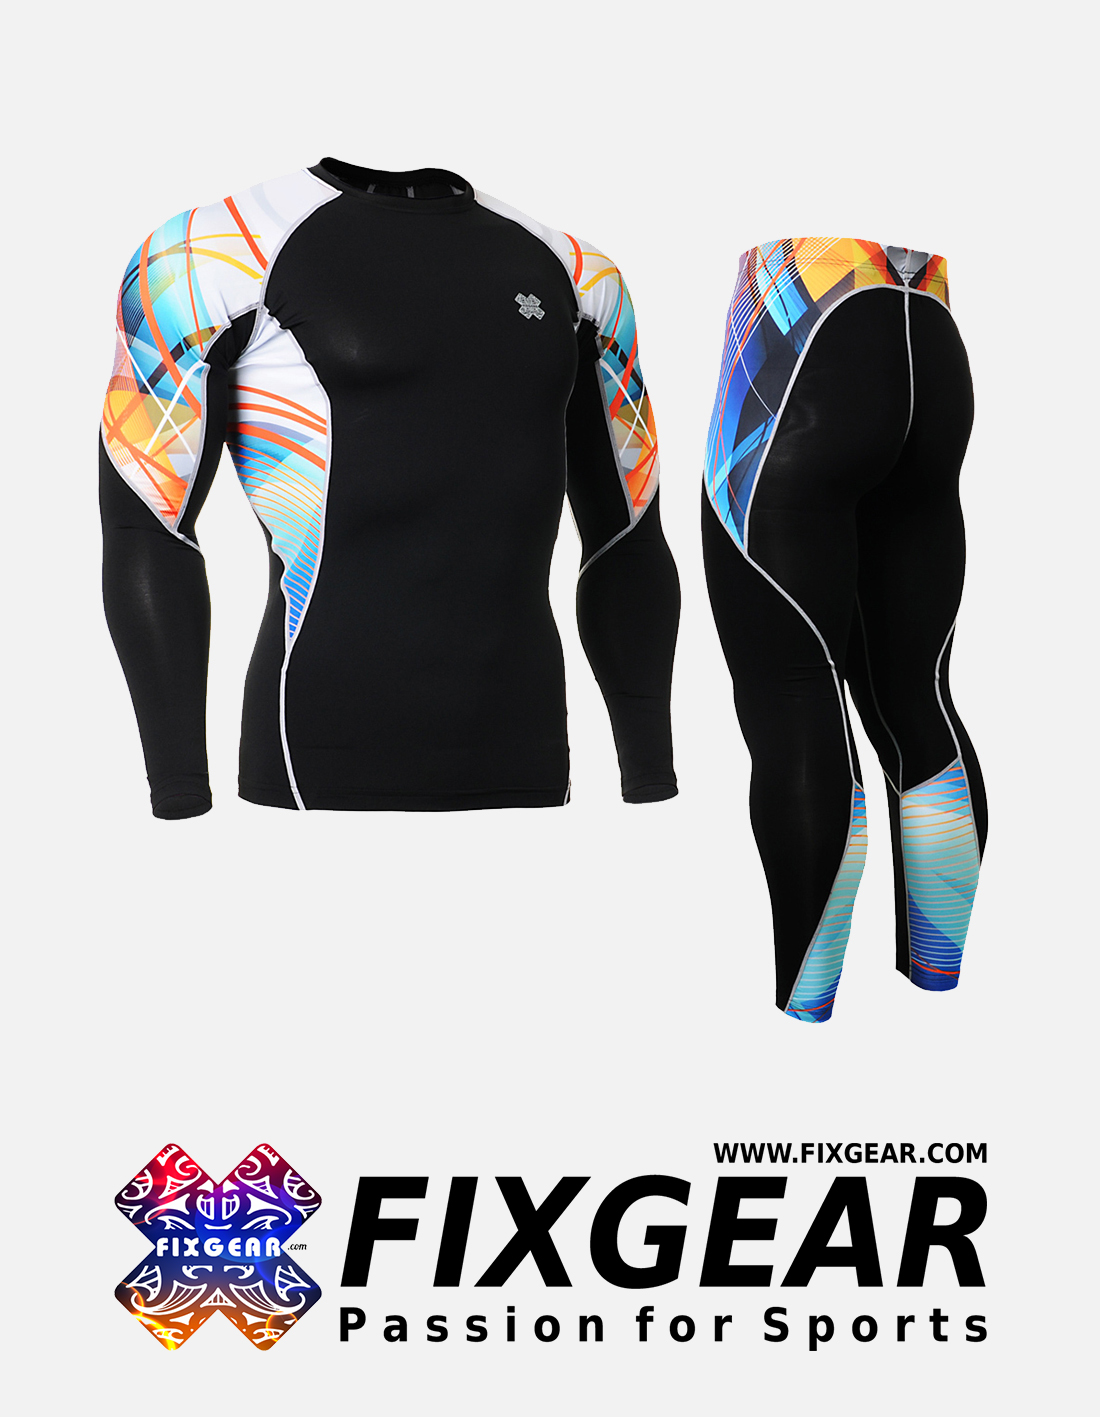 FIXGEAR C2L-P2L-B49 Set Compression Base Layer Shirt & Legging Pants